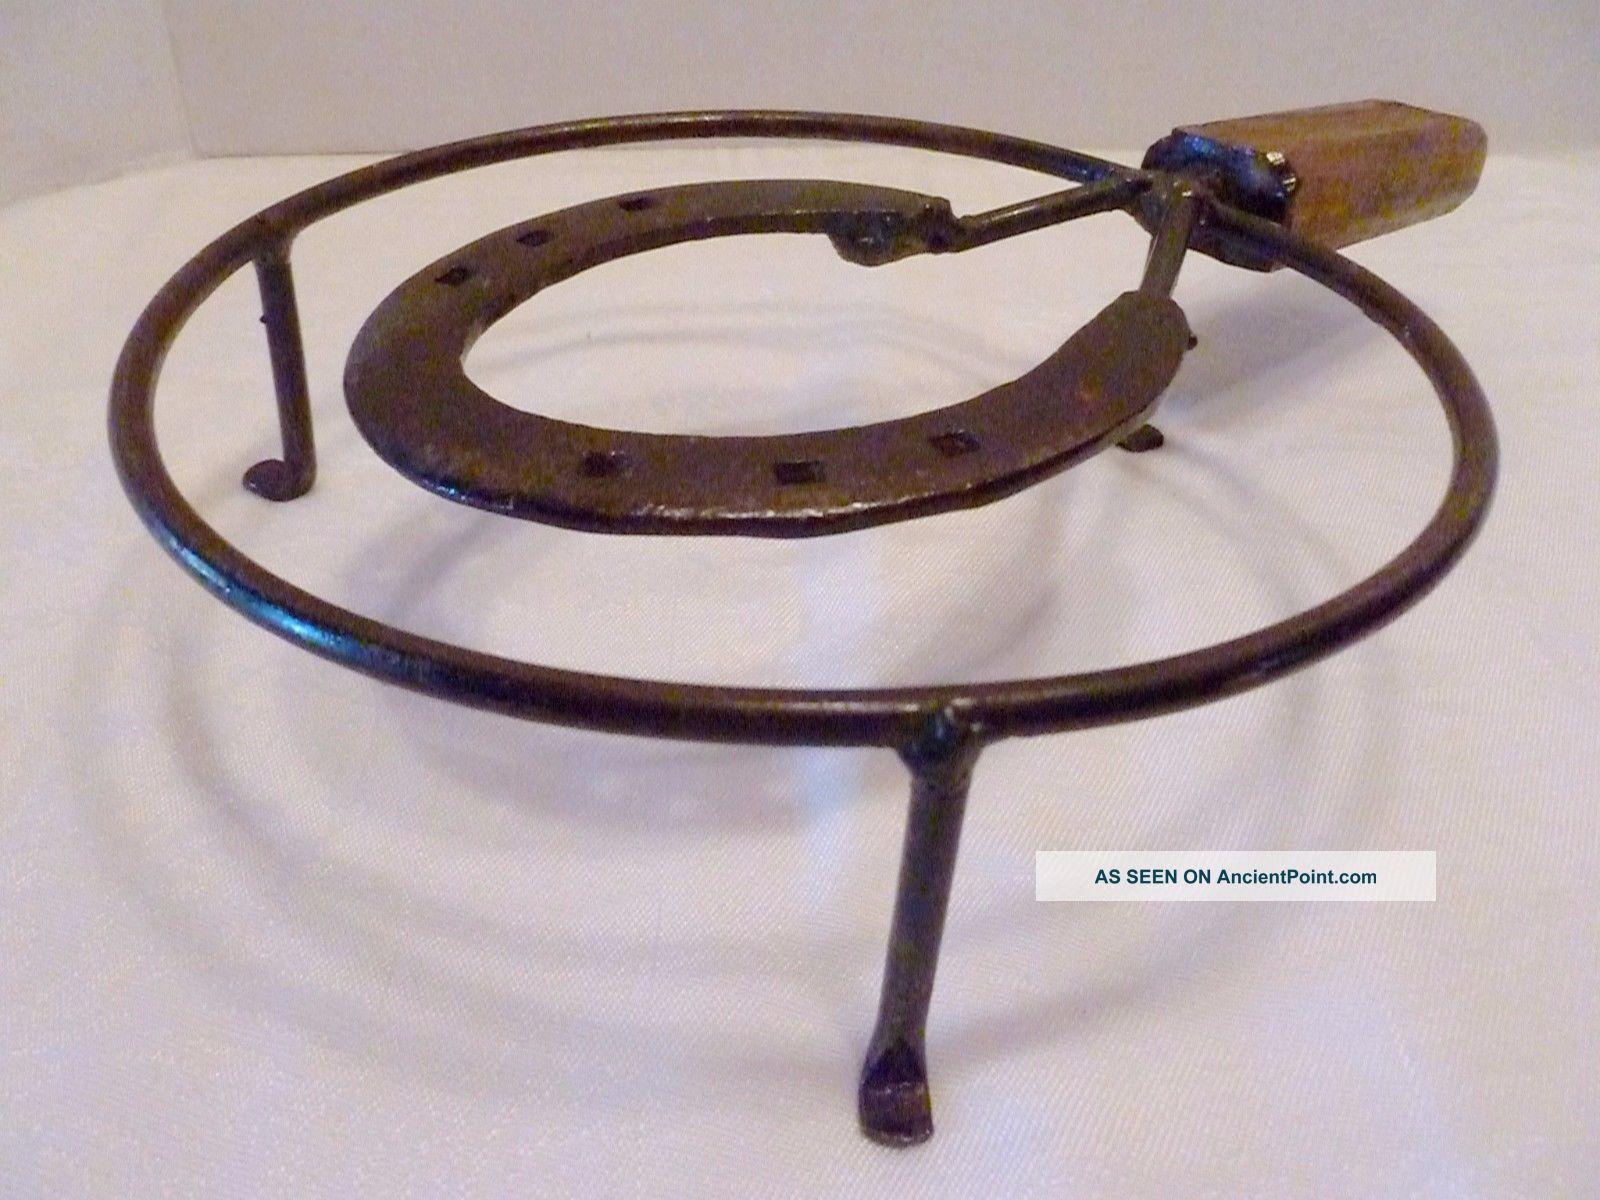 Antique Primitive Blacksmith Horseshoe Art Iron & Wood Hearth Trivet Pot Stand Trivets photo